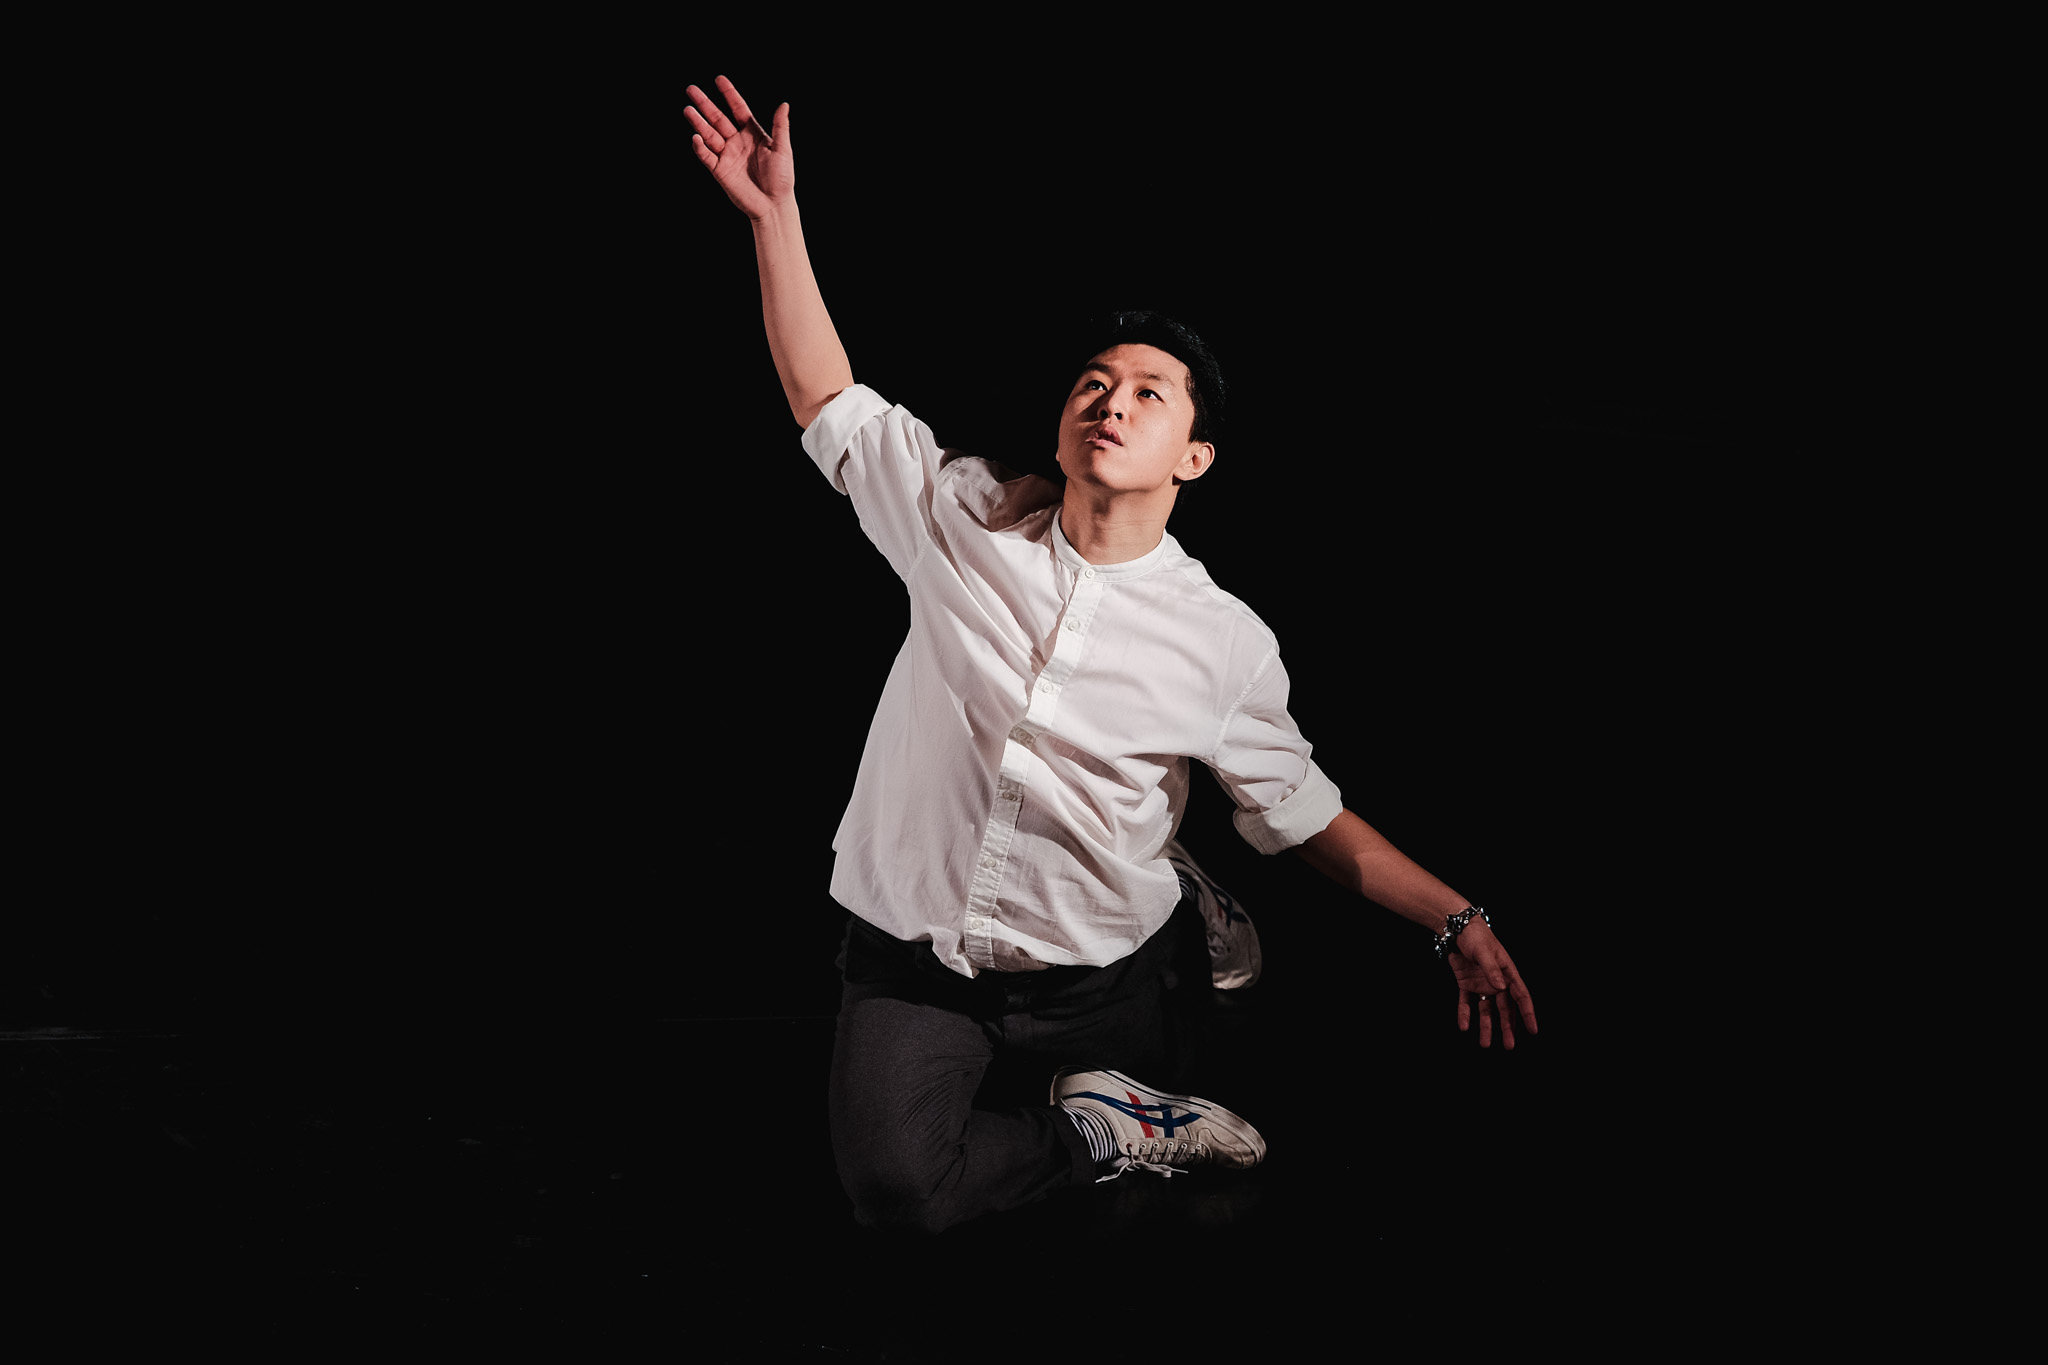 Dance_Halifax_arts_kinetic_breath_Fox_and_fellow-2.jpg